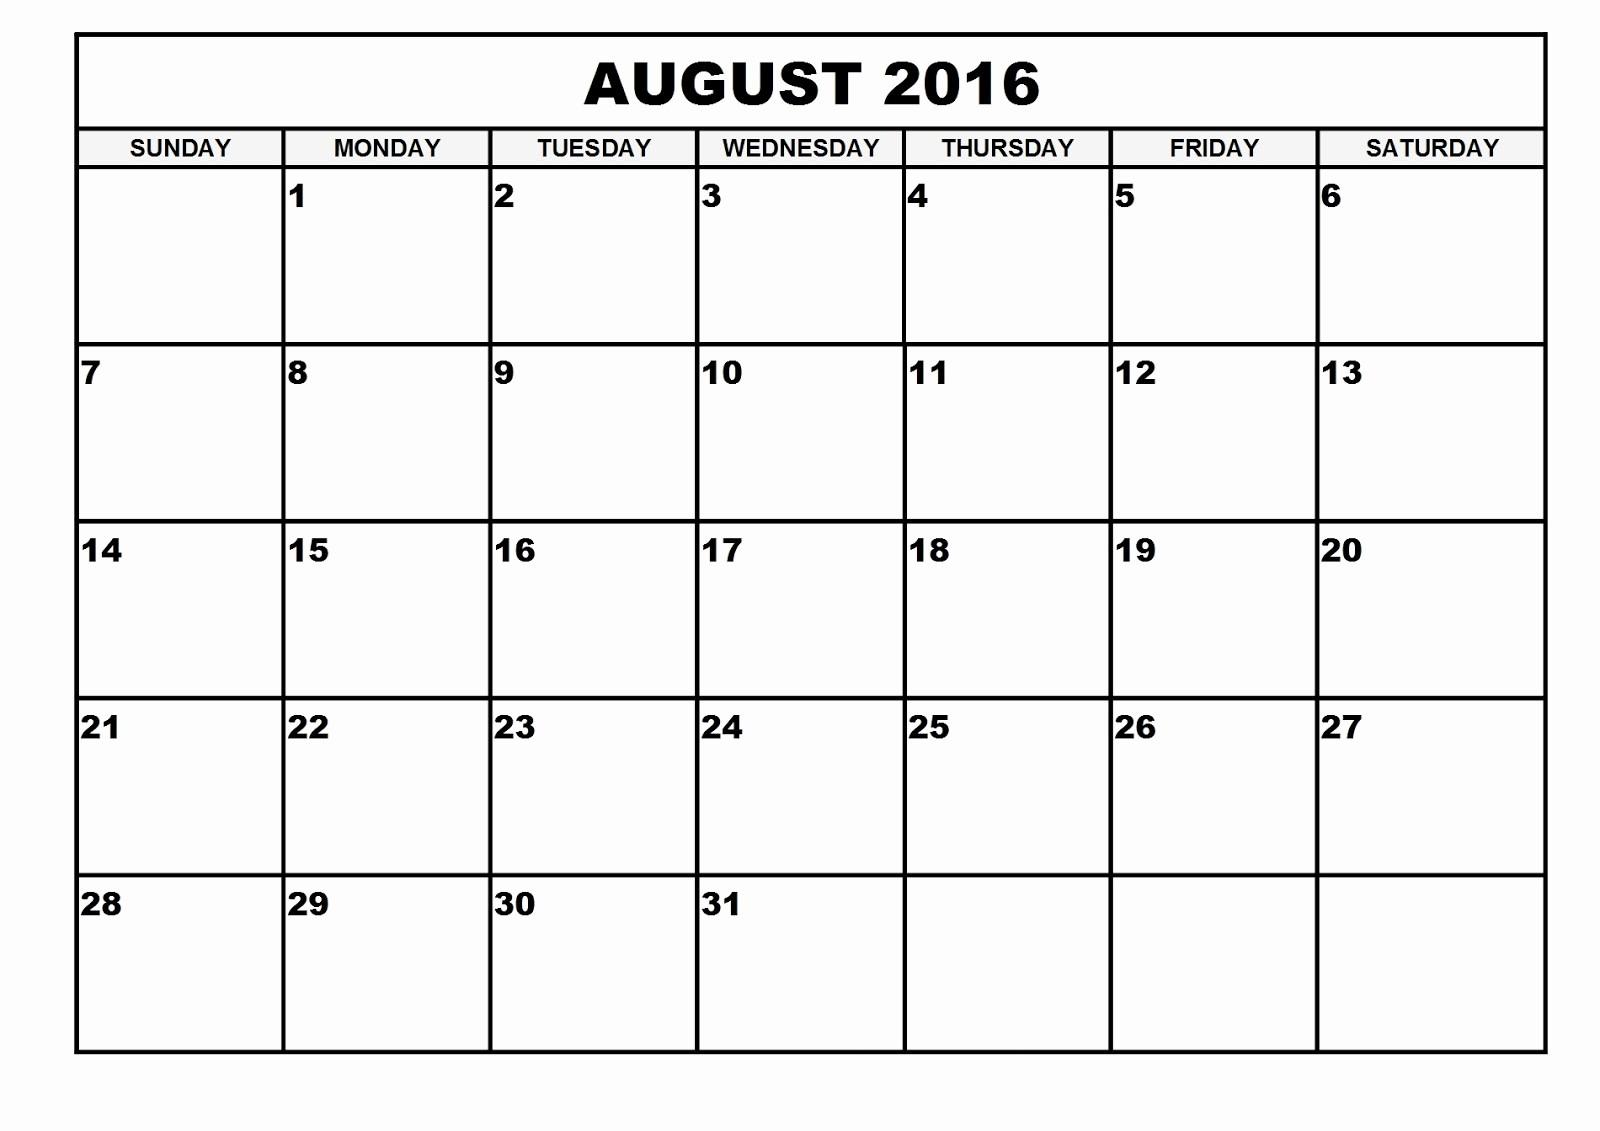 Printable 6 Month Calendar 2016 Inspirational 2016 Monthly Blank Calendar August 2016 Printable